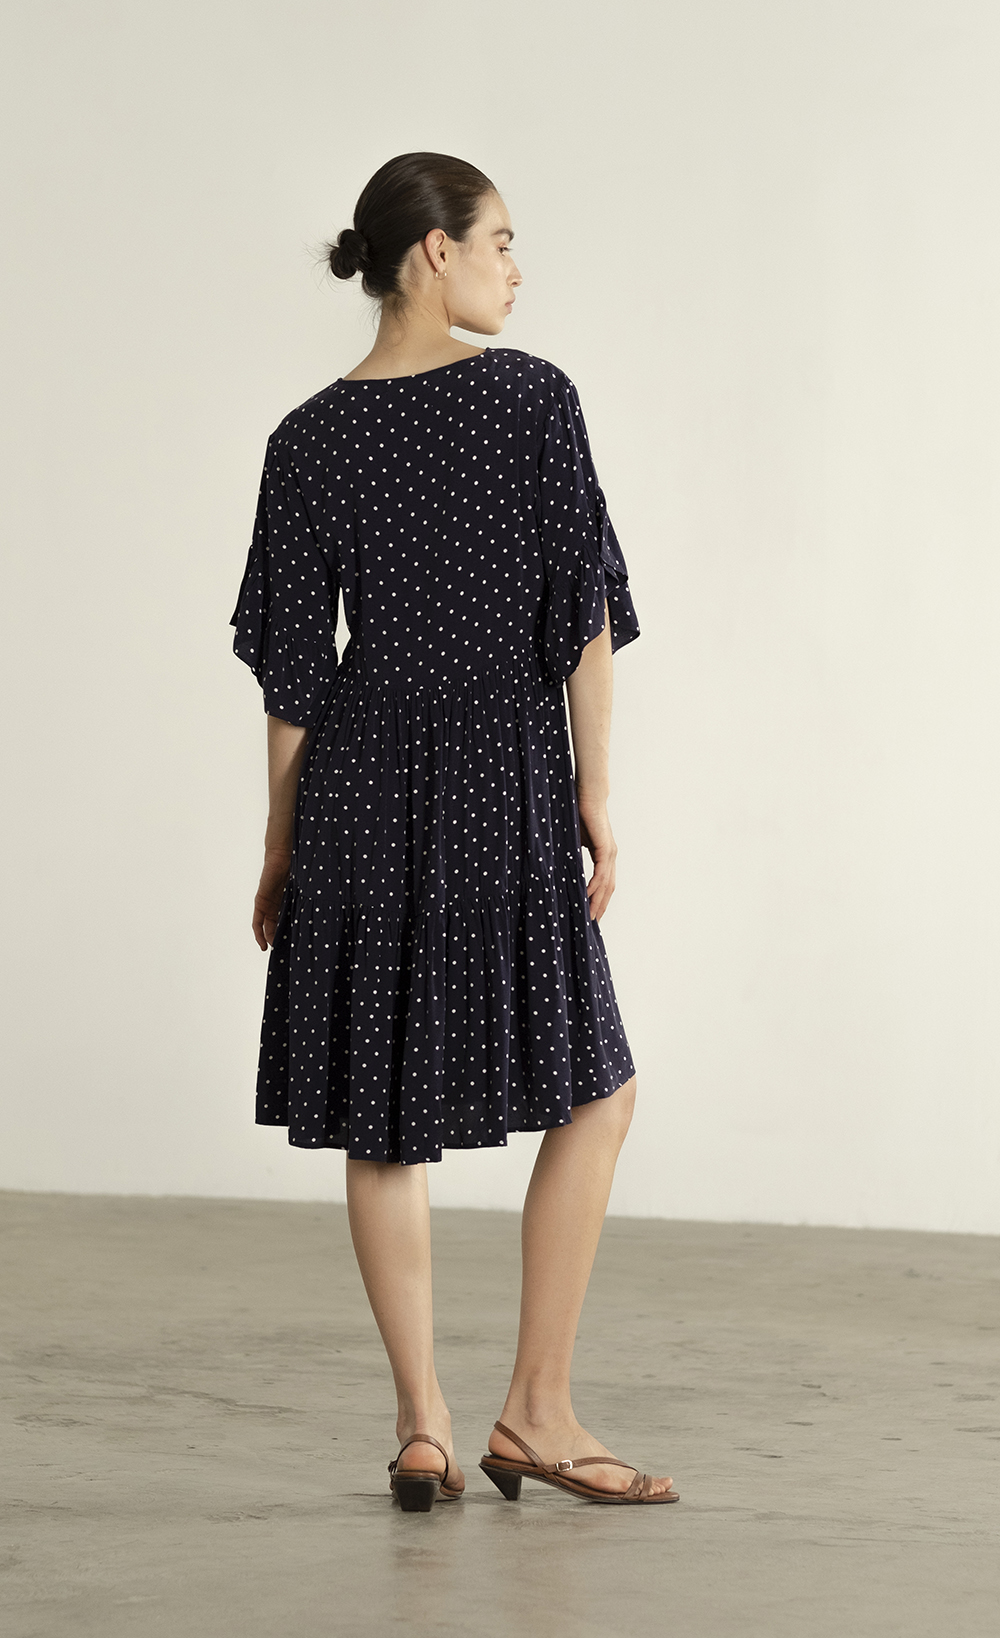 Maria Stanley Spring 2019 Gayle dress cupro navy polka dot 03